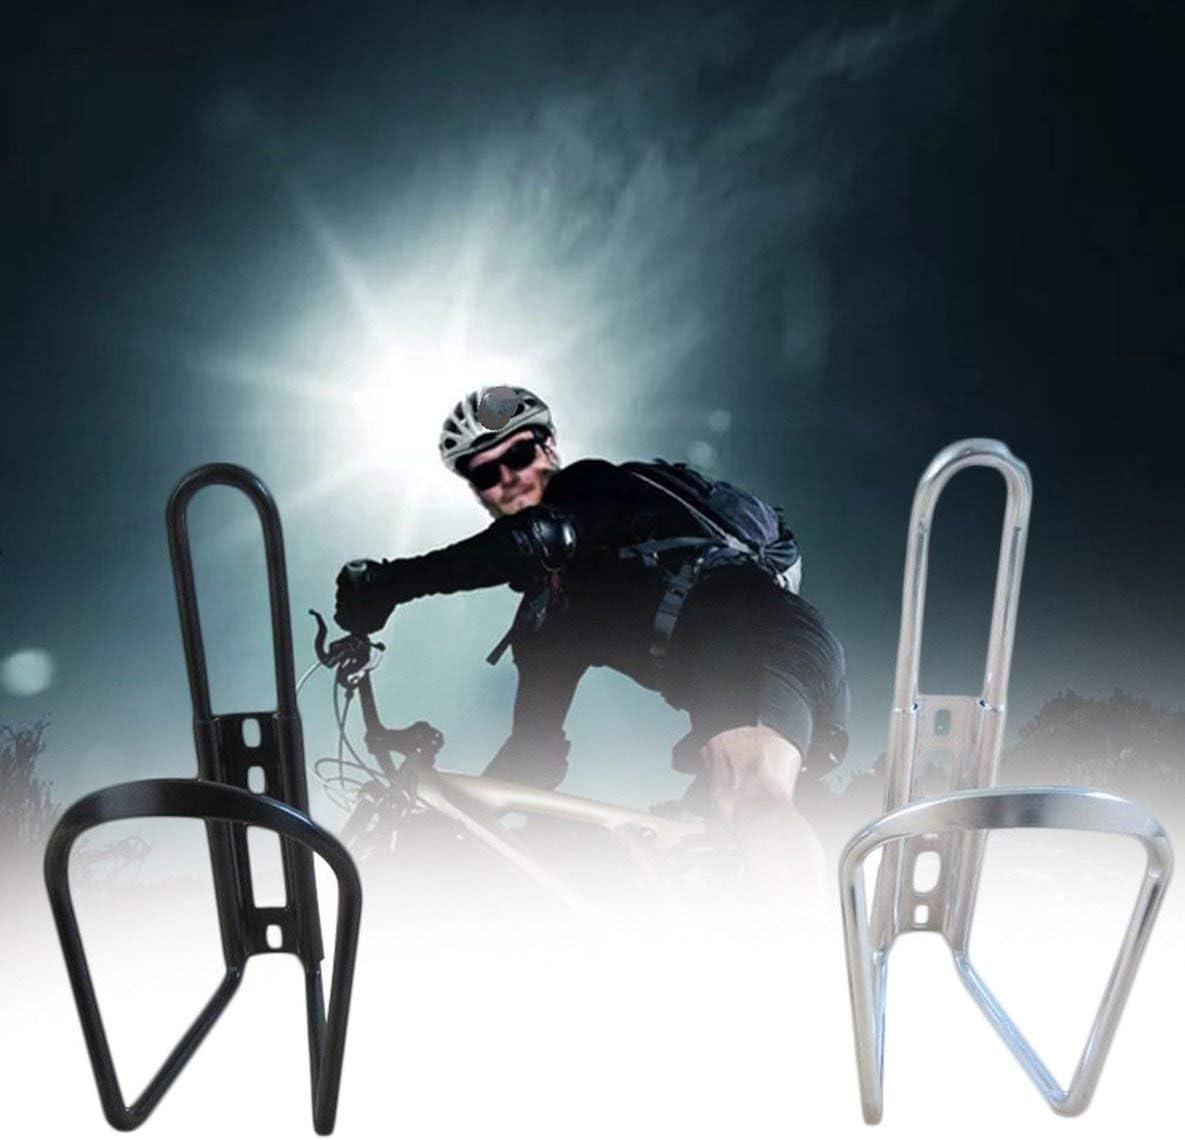 nbvmngjhjlkjlUK Portabid/ón para Bicicleta Portabid/ón de Aluminio Portabicicletas para Bicicleta de monta/ña Soporte para Bicicleta Montar en Bicicleta Accesorios para Bicicletas Negro